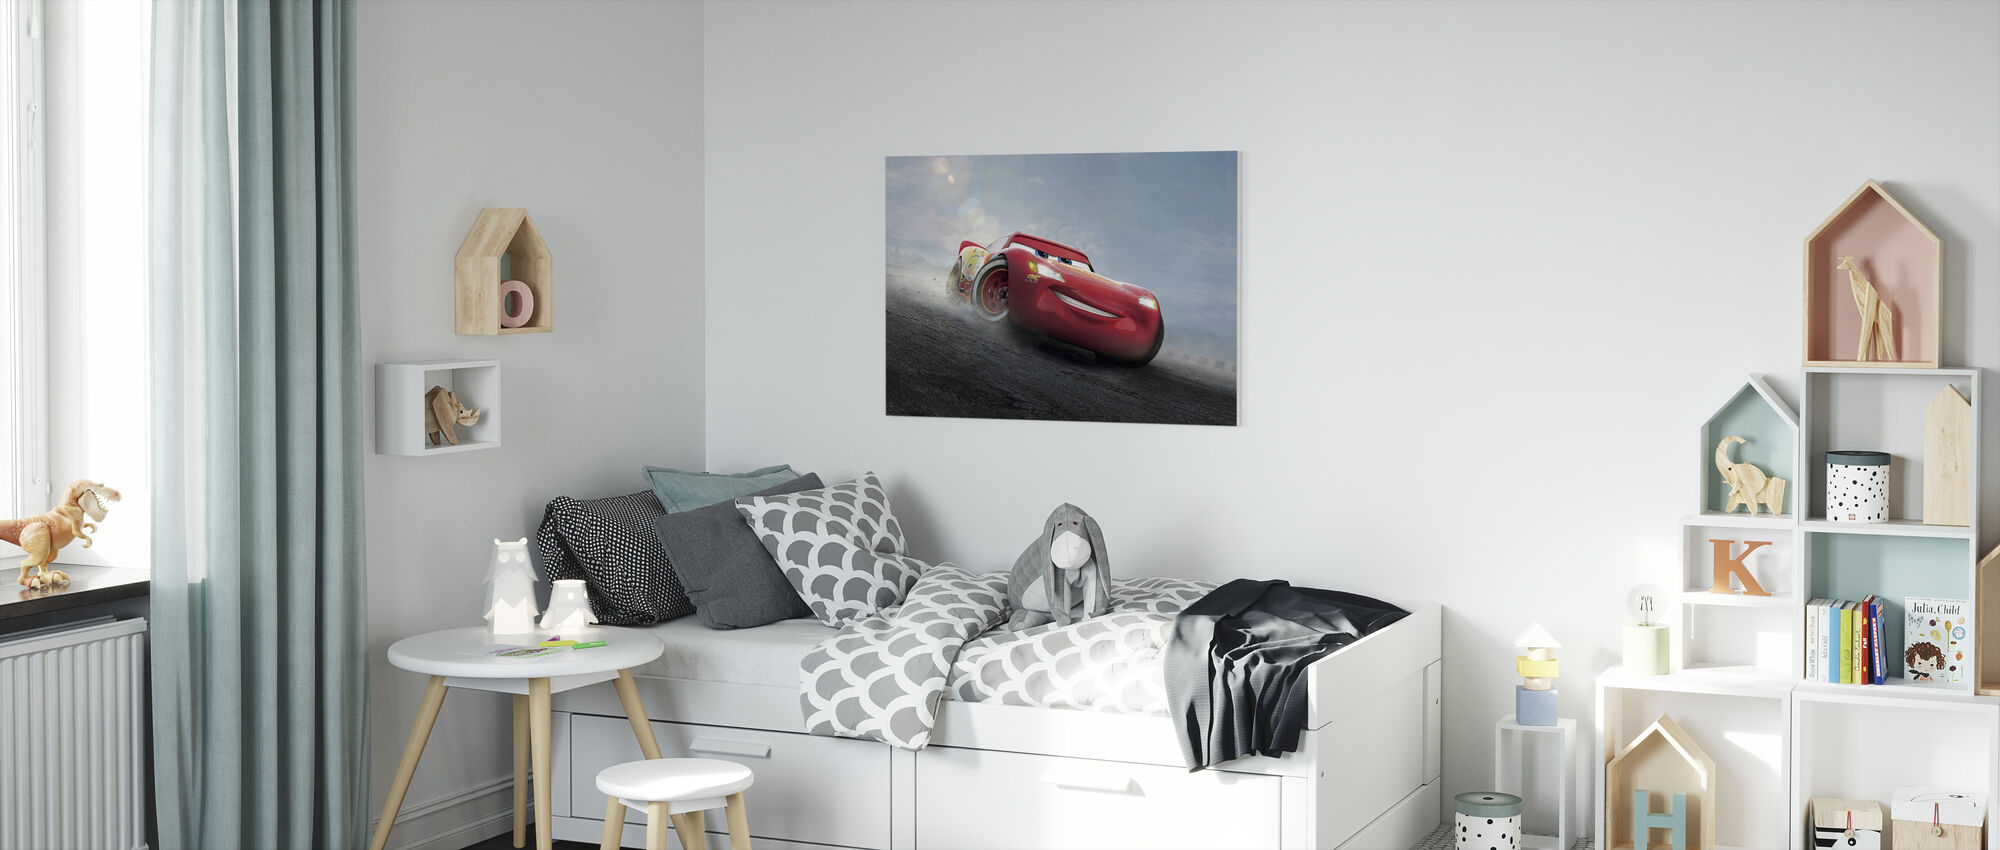 Biler 3 - Den legendariske lynet McQueen - Lerretsbilde - Barnerom